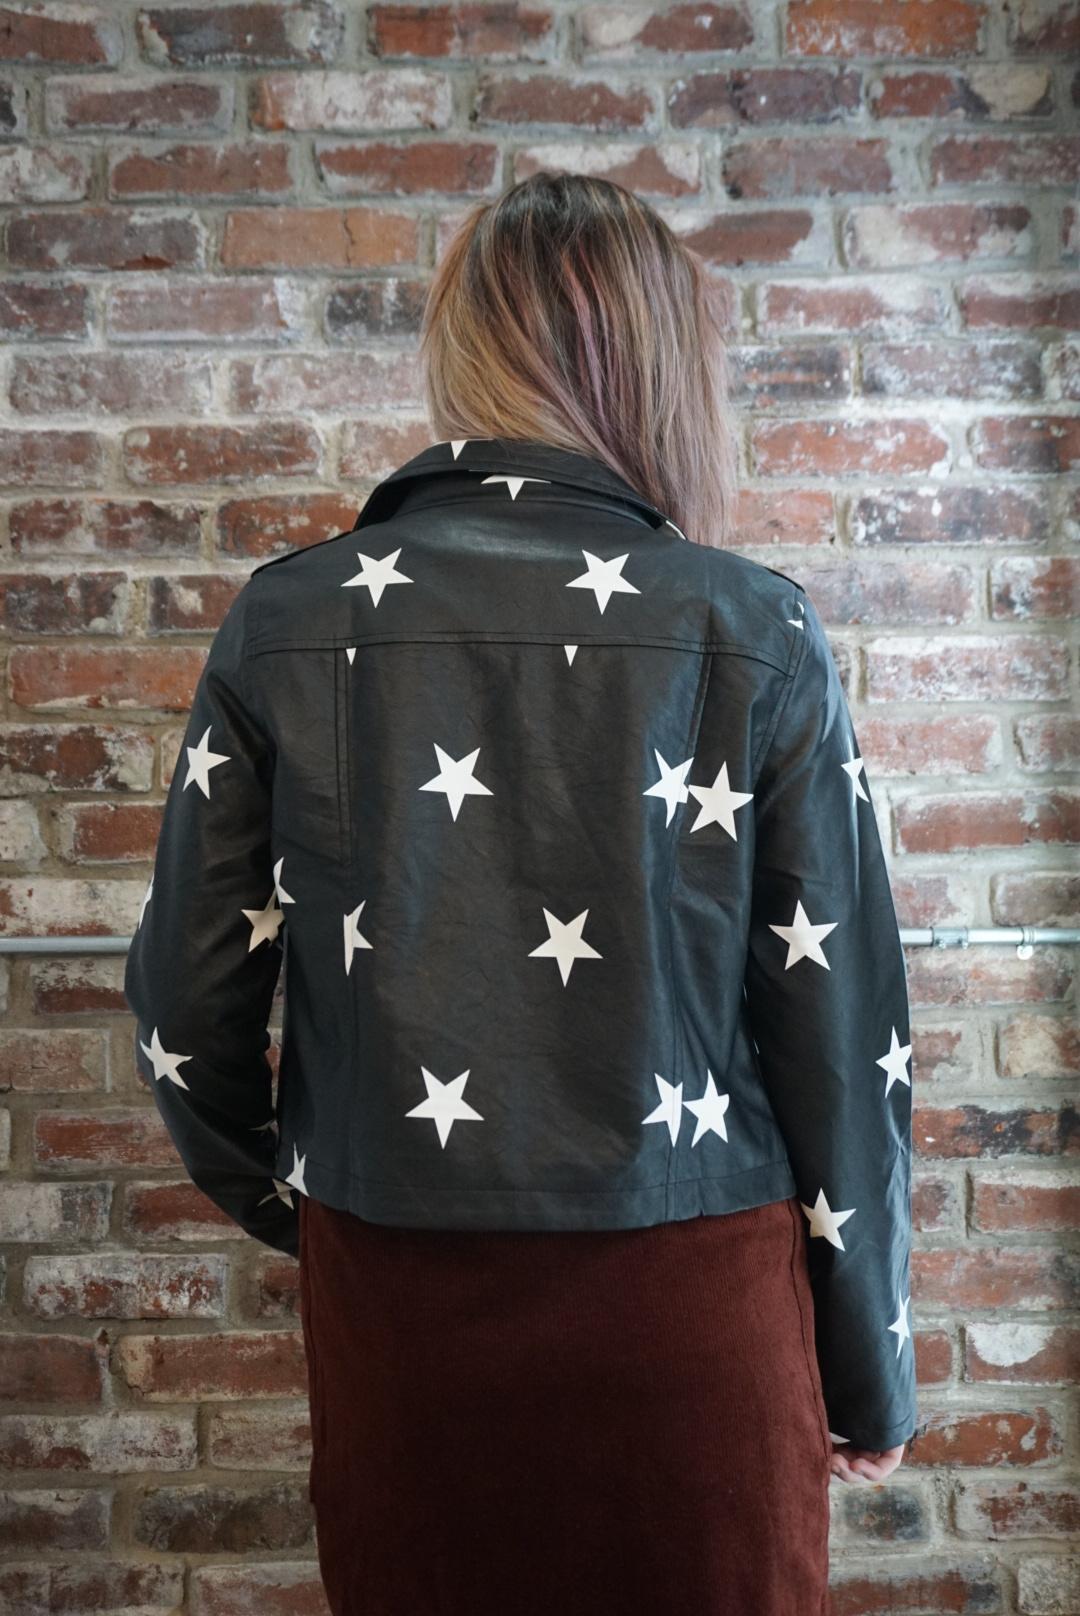 Le Lis Star Crossed Lovers Jacket